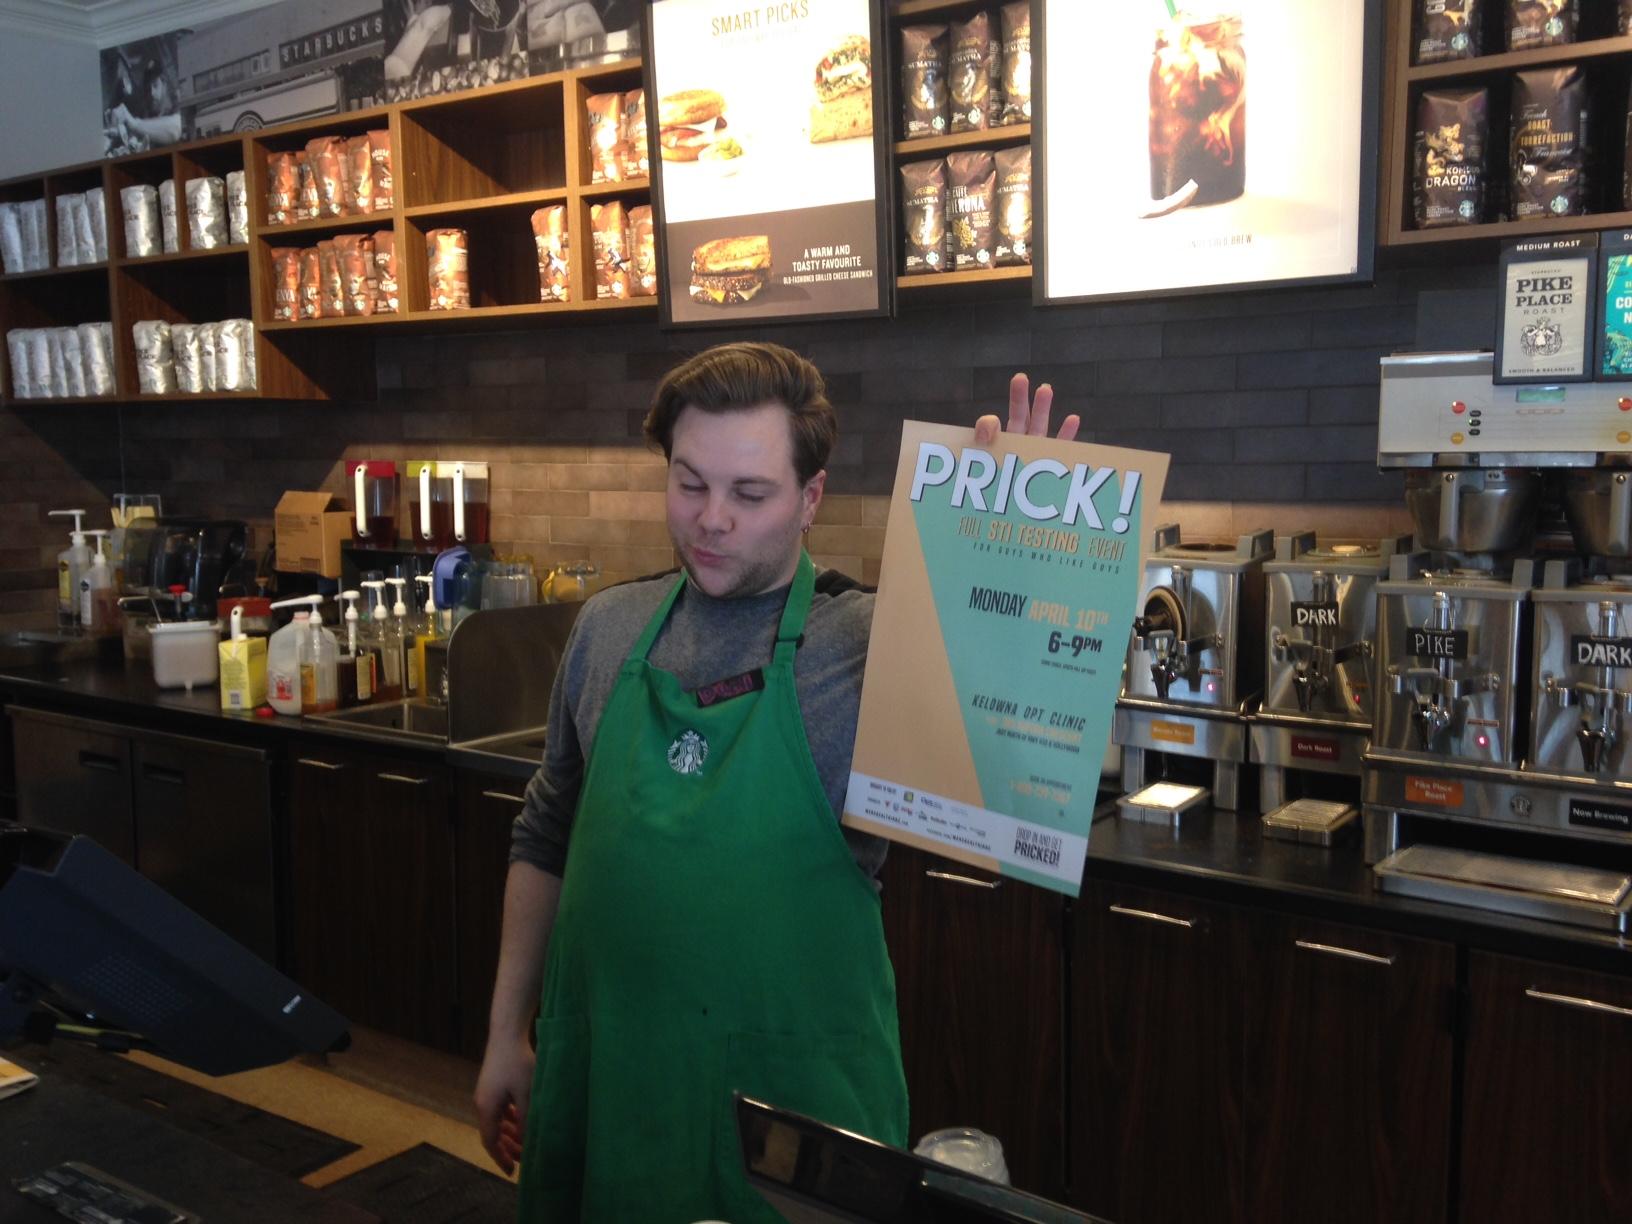 Starbucks supports PRICK!